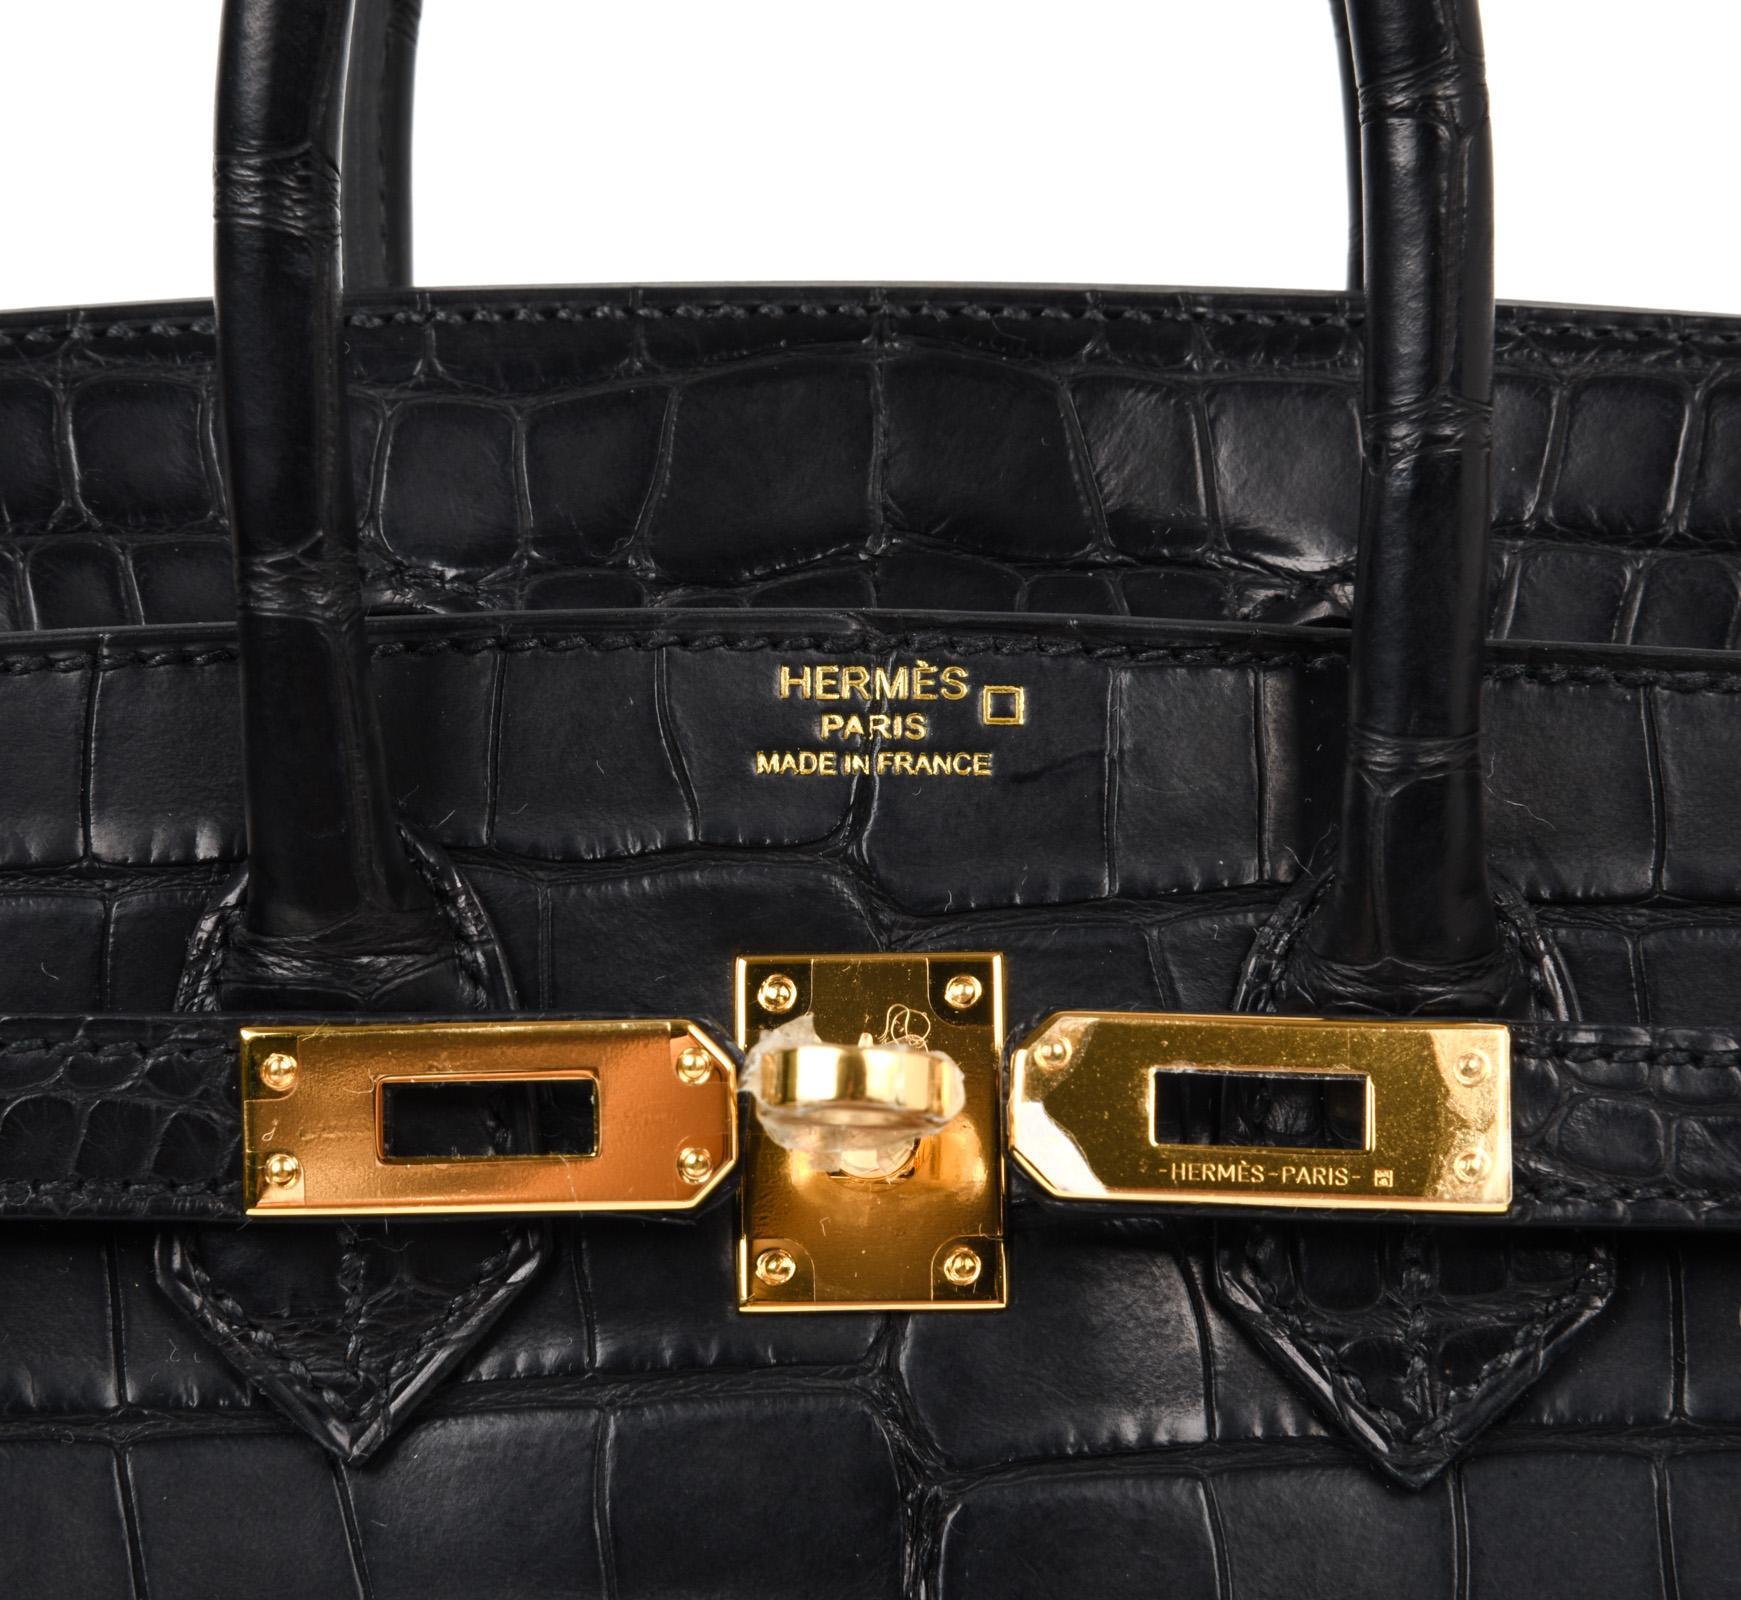 1cbc4b63fdc ... discount hermes birkin 25 bag matte black alligator gold hardware in  new condition for sale in